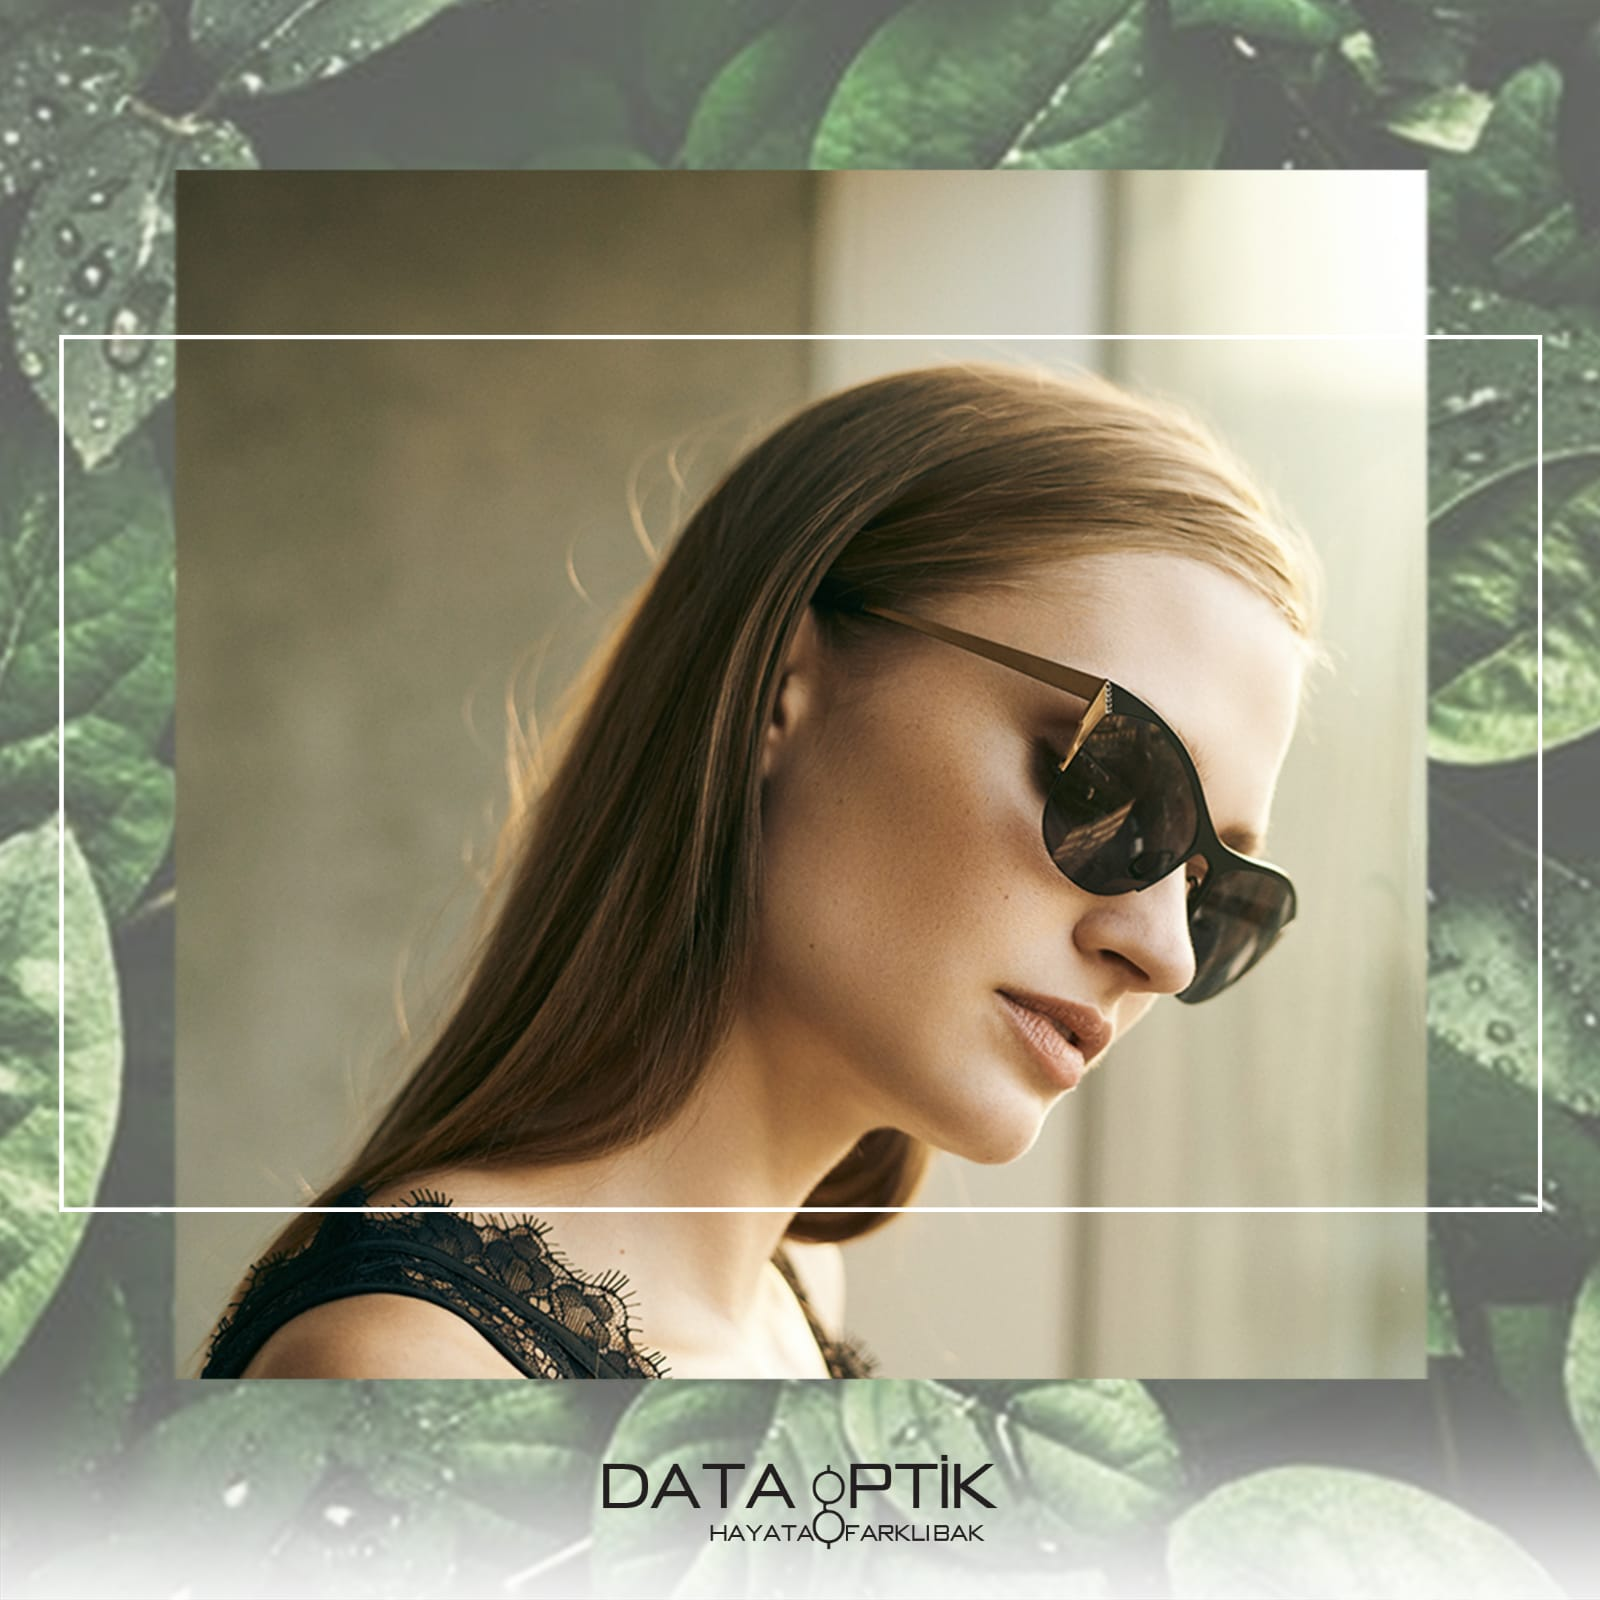 Data Optik